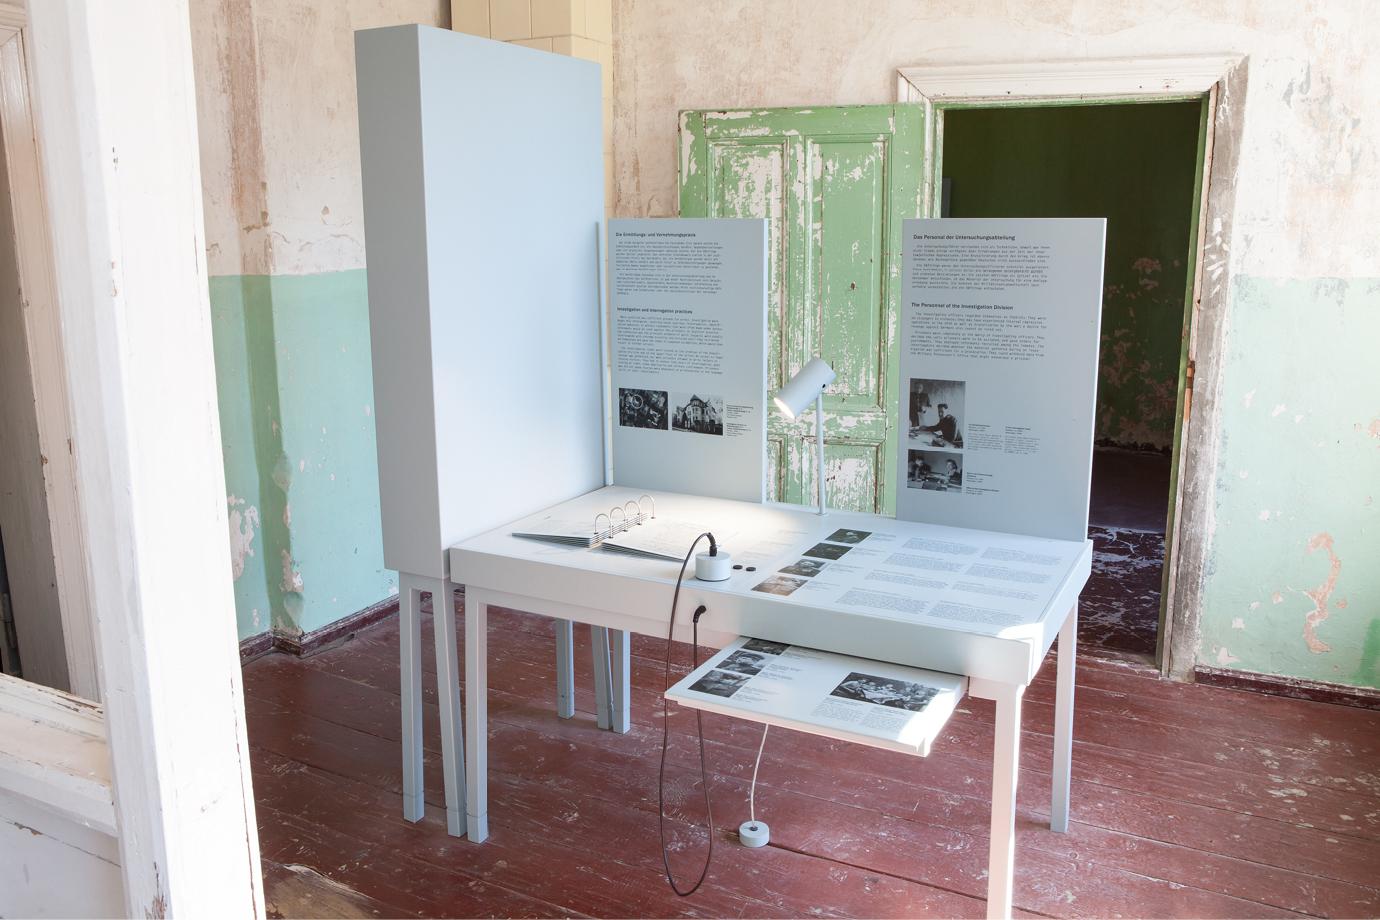 http://e-o-t.de/wordpress/wp-content/uploads/2017/04/2012_eot-Leistikow-Exhibition-12.jpg